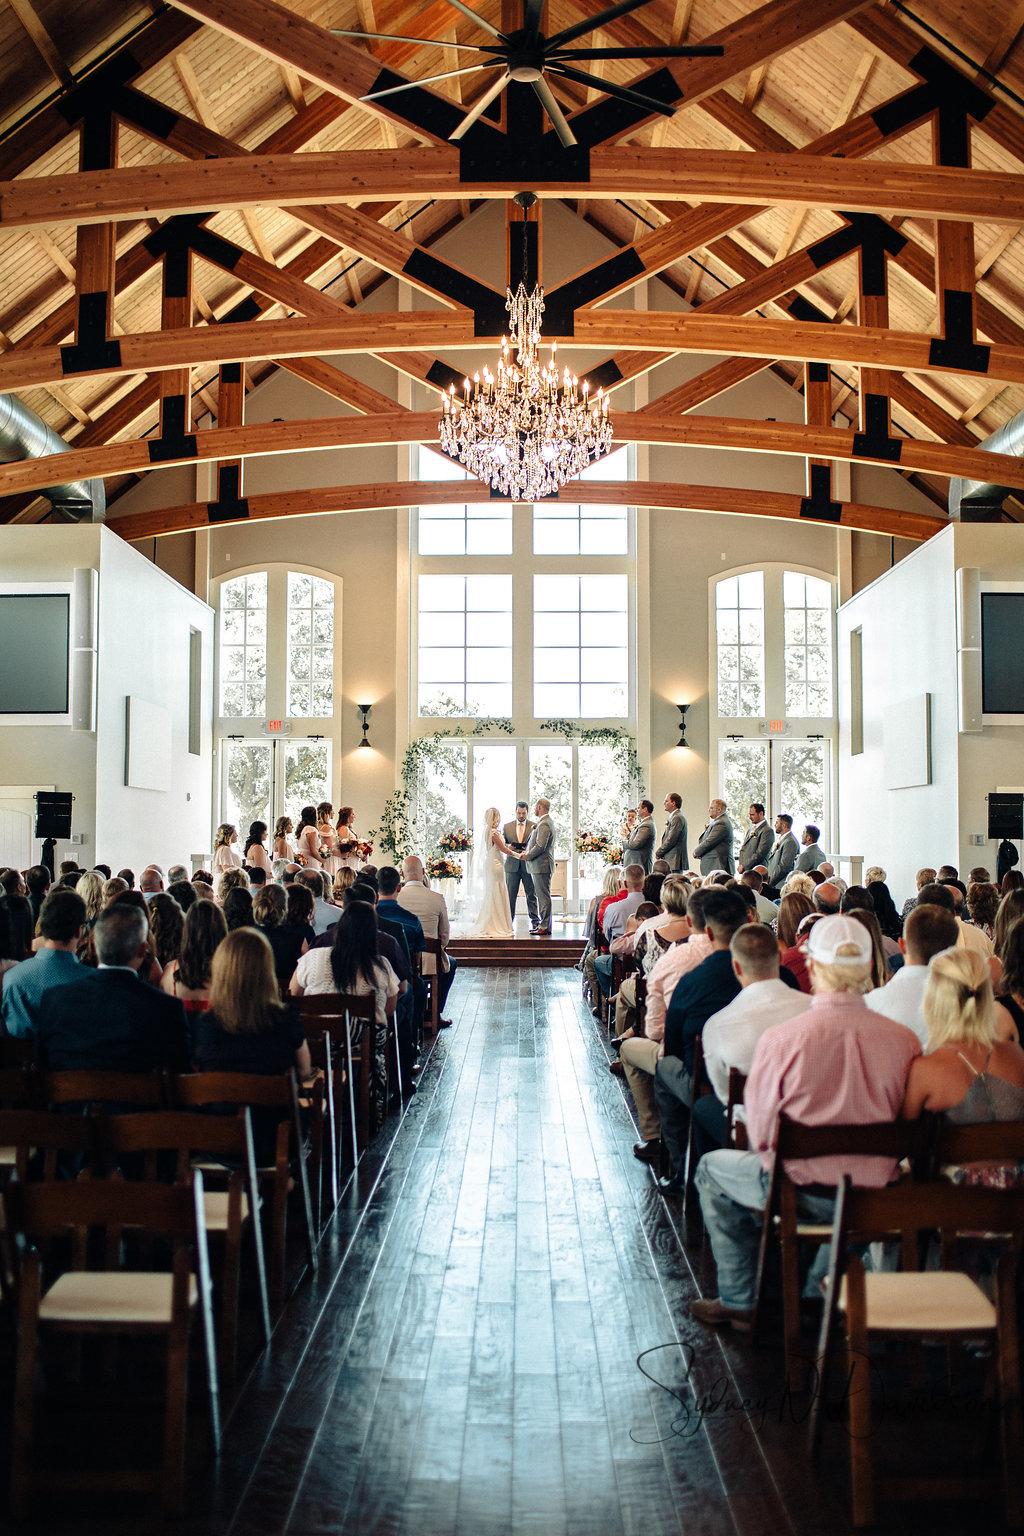 sydney-davidson-wedding-stillwater-oklahoma-wedding-session-traveling-photographer-portrait-tulsa-oklahoma-6522.jpg